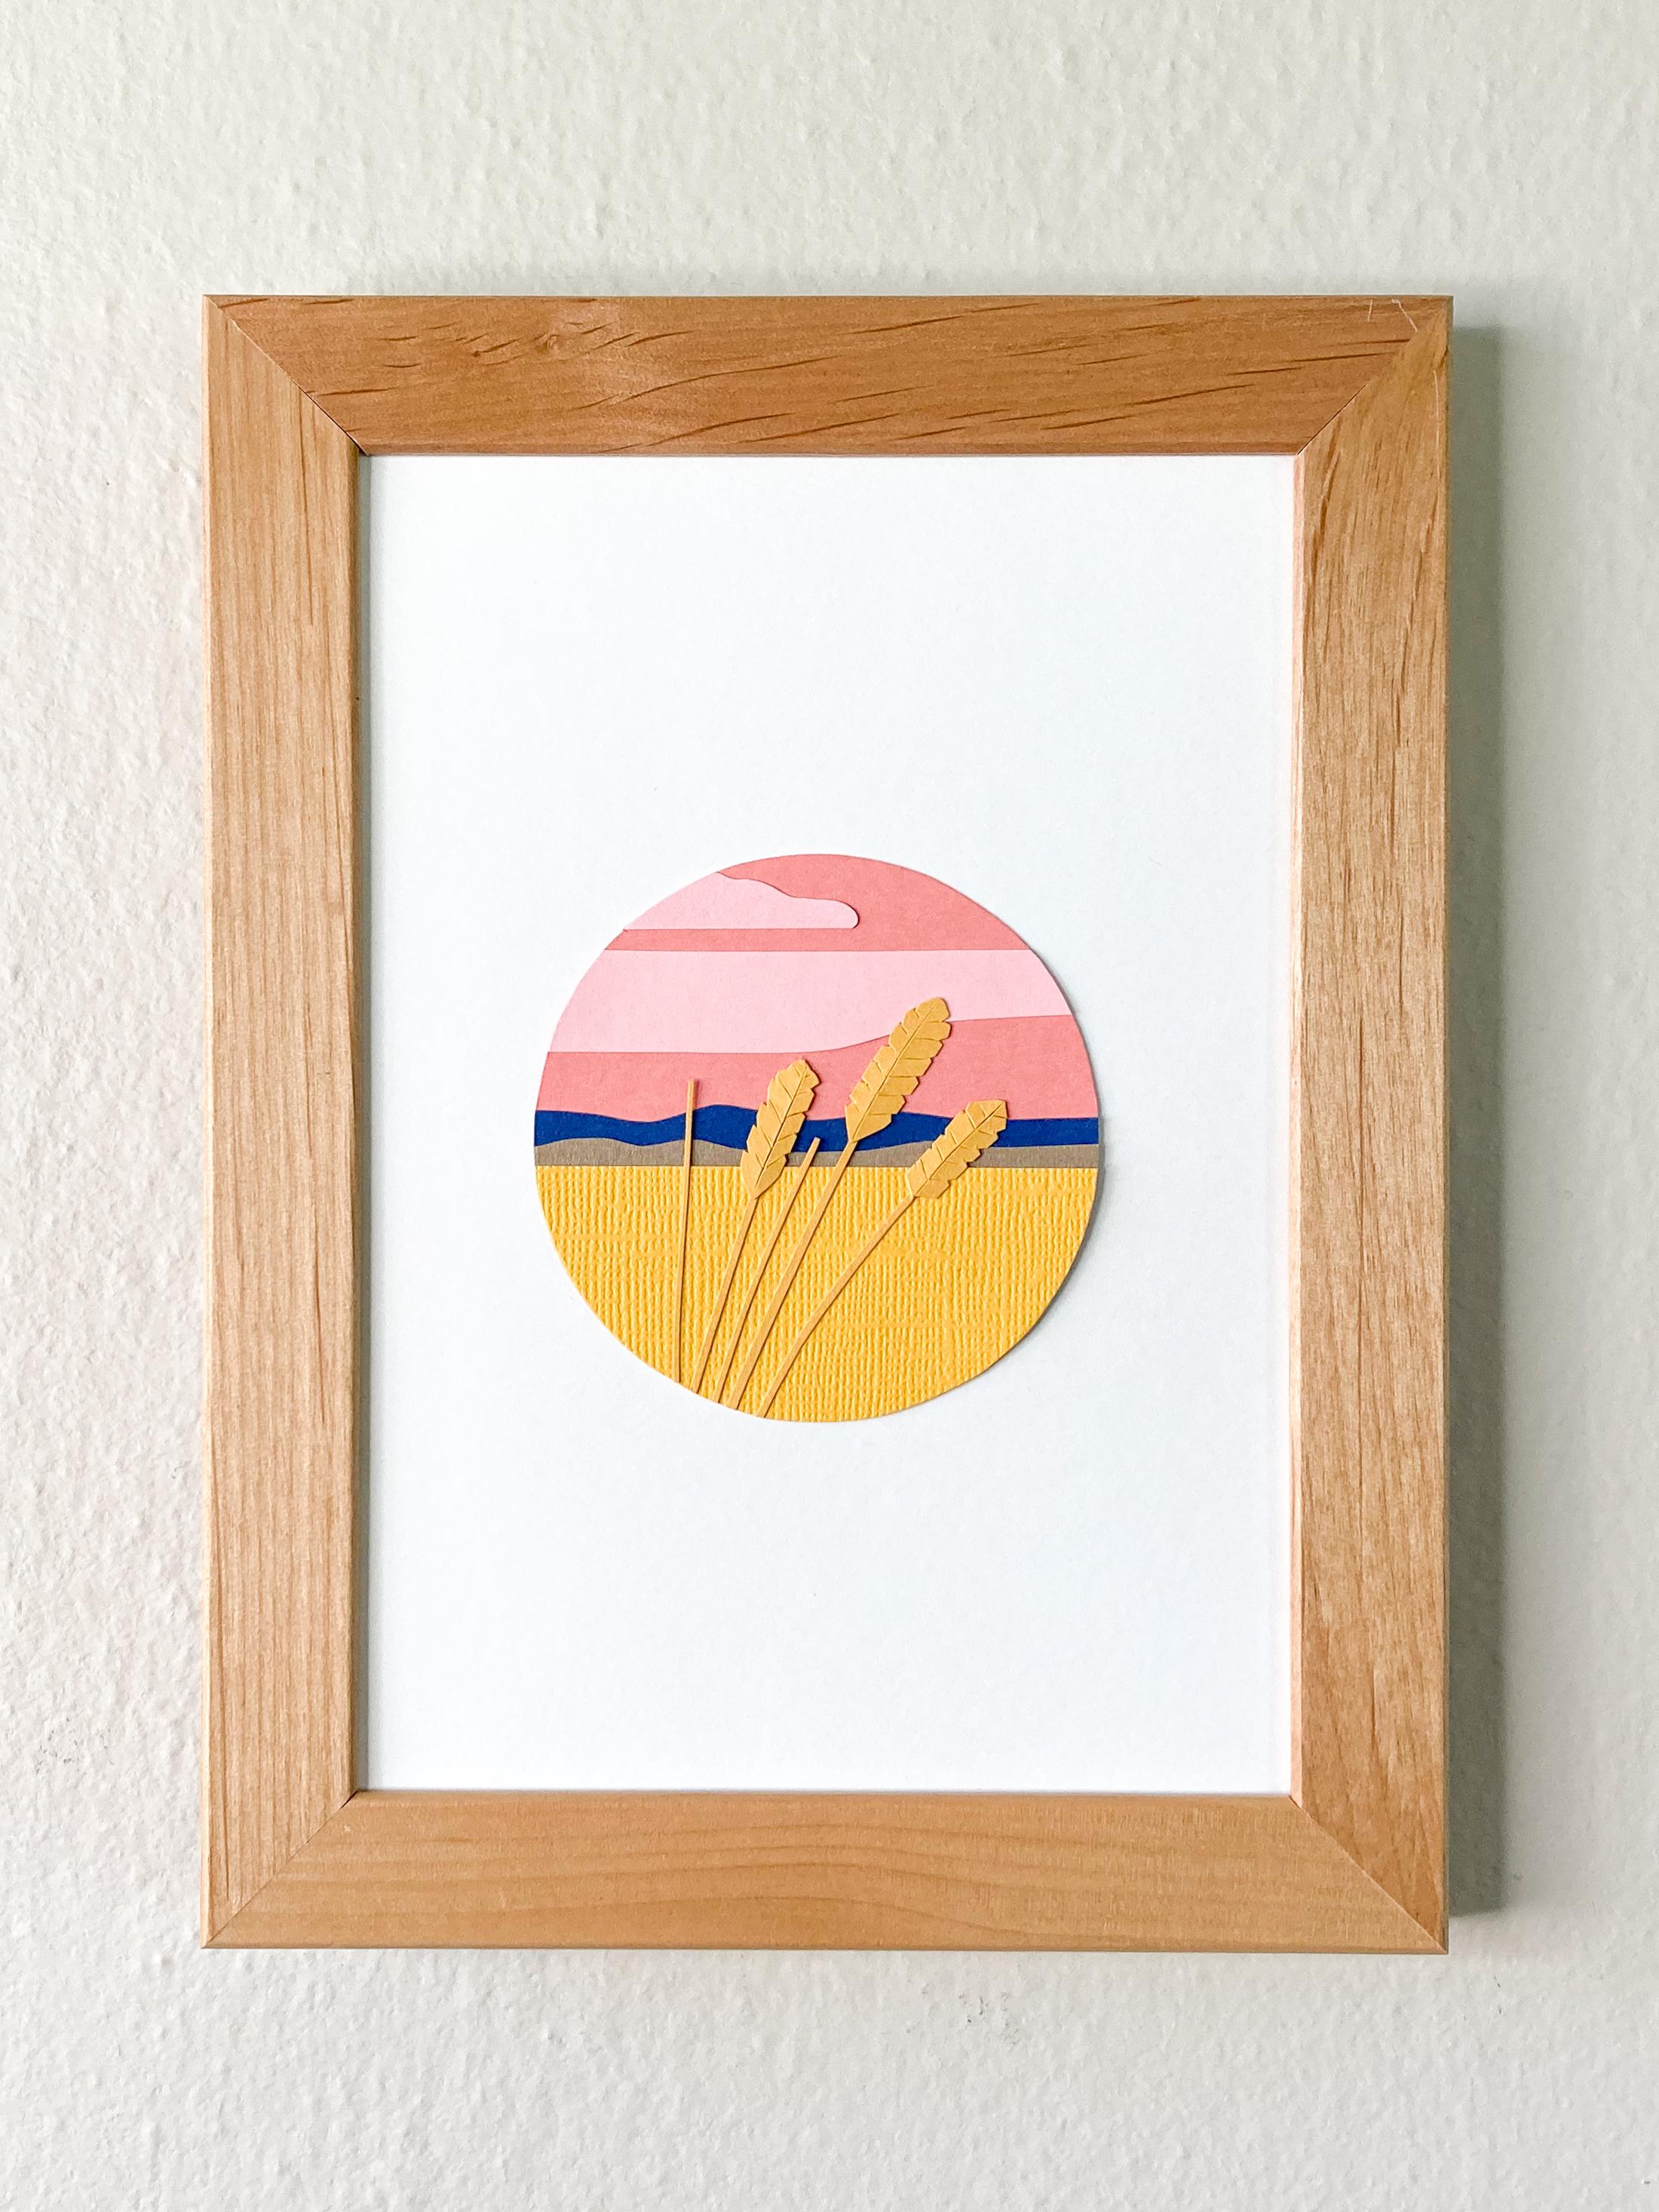 Walla Walla Wheat Sunset | 5 x 7 Cut Paper $160